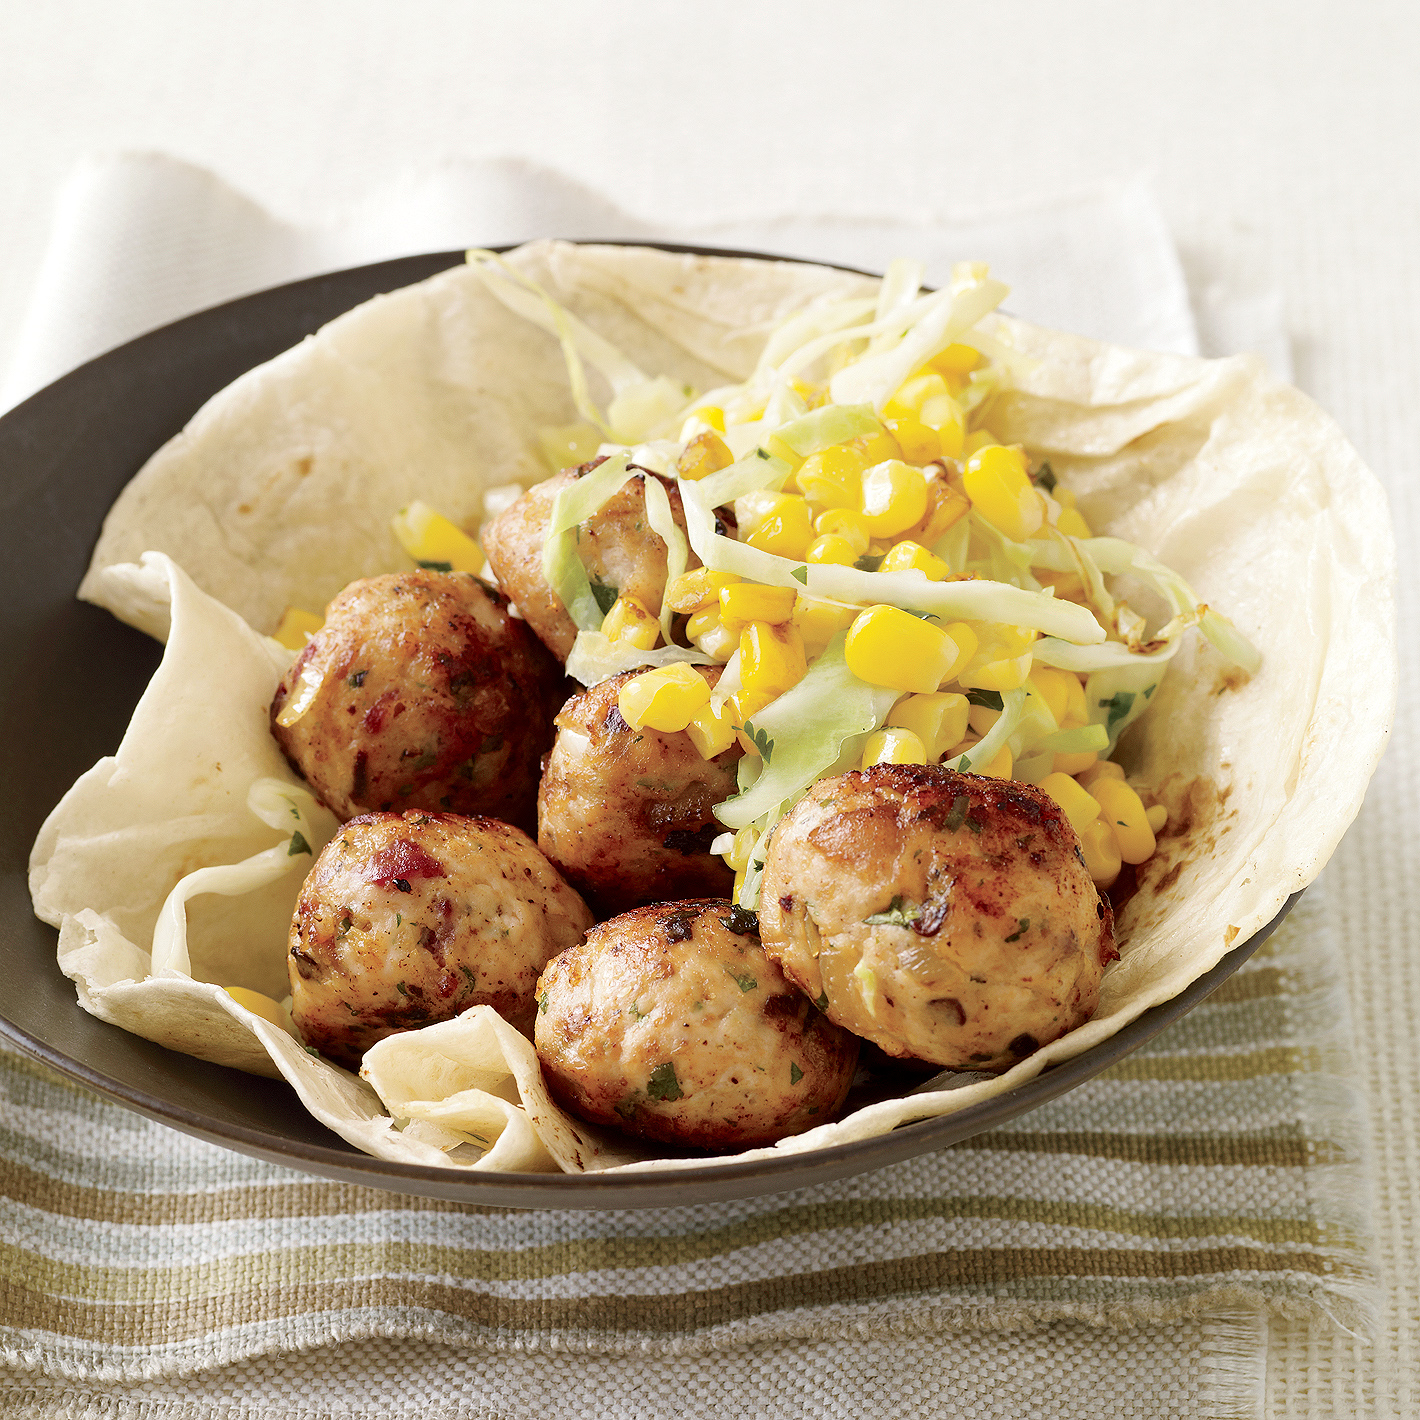 Chipotle-Chicken Meatballs